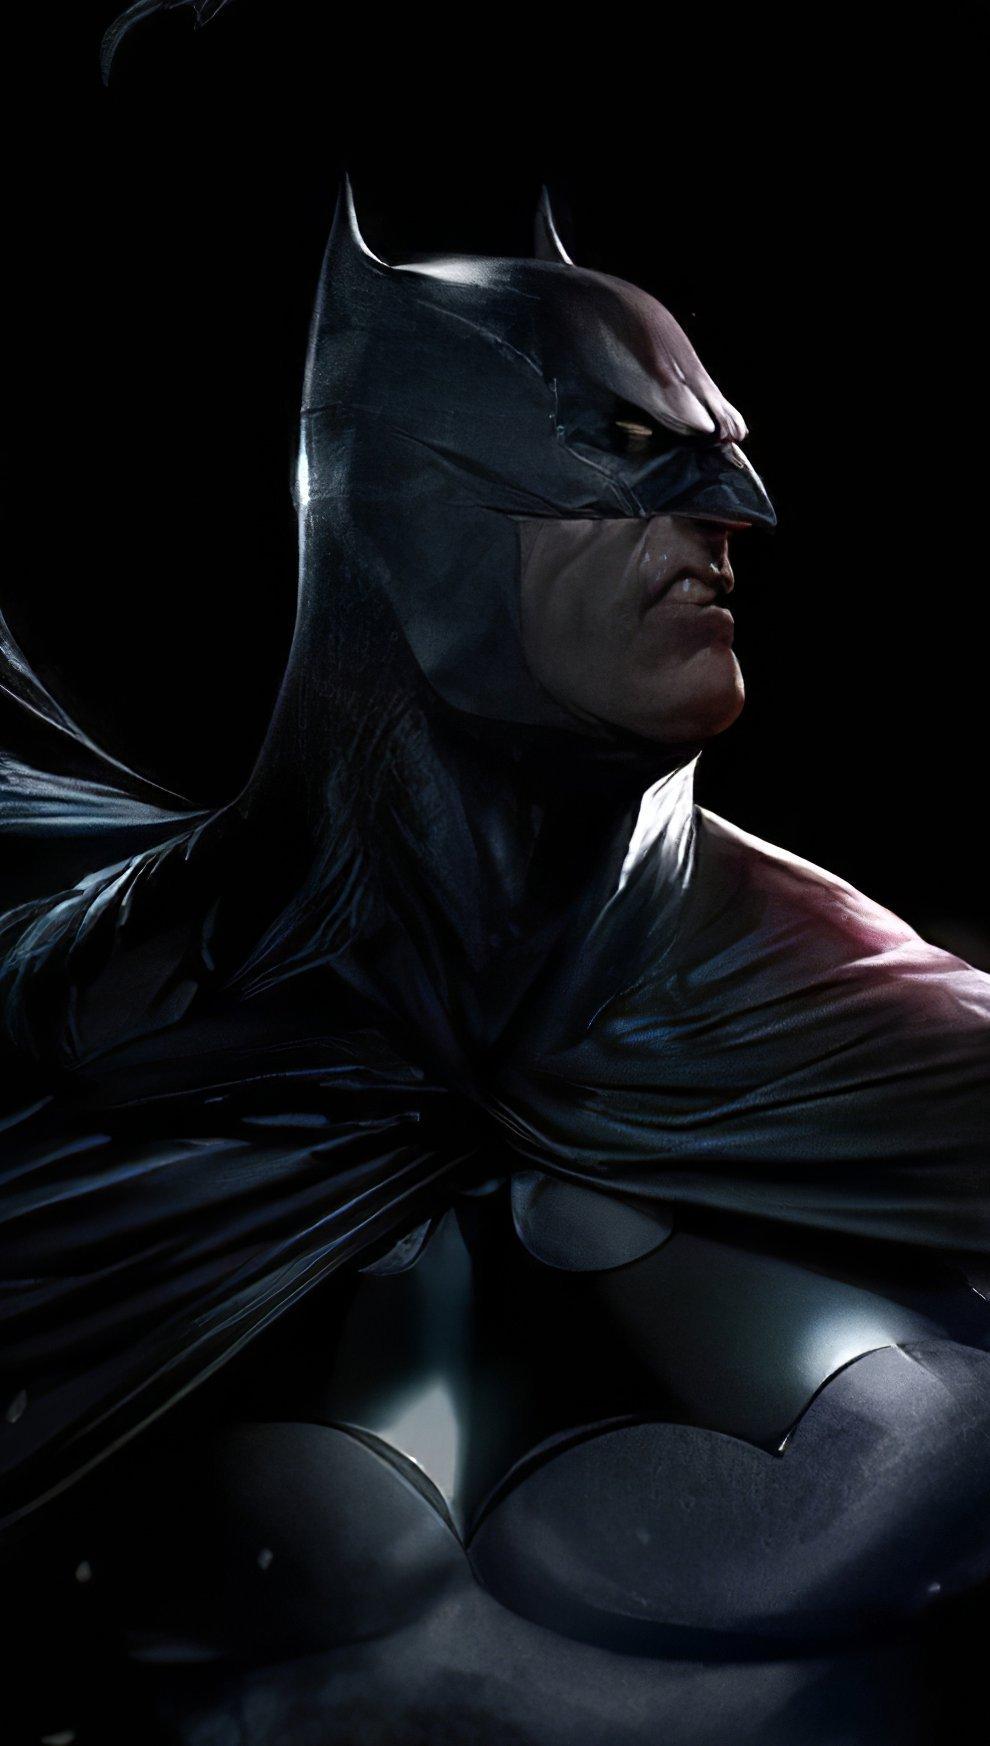 Wallpaper Batman in the dark Vertical